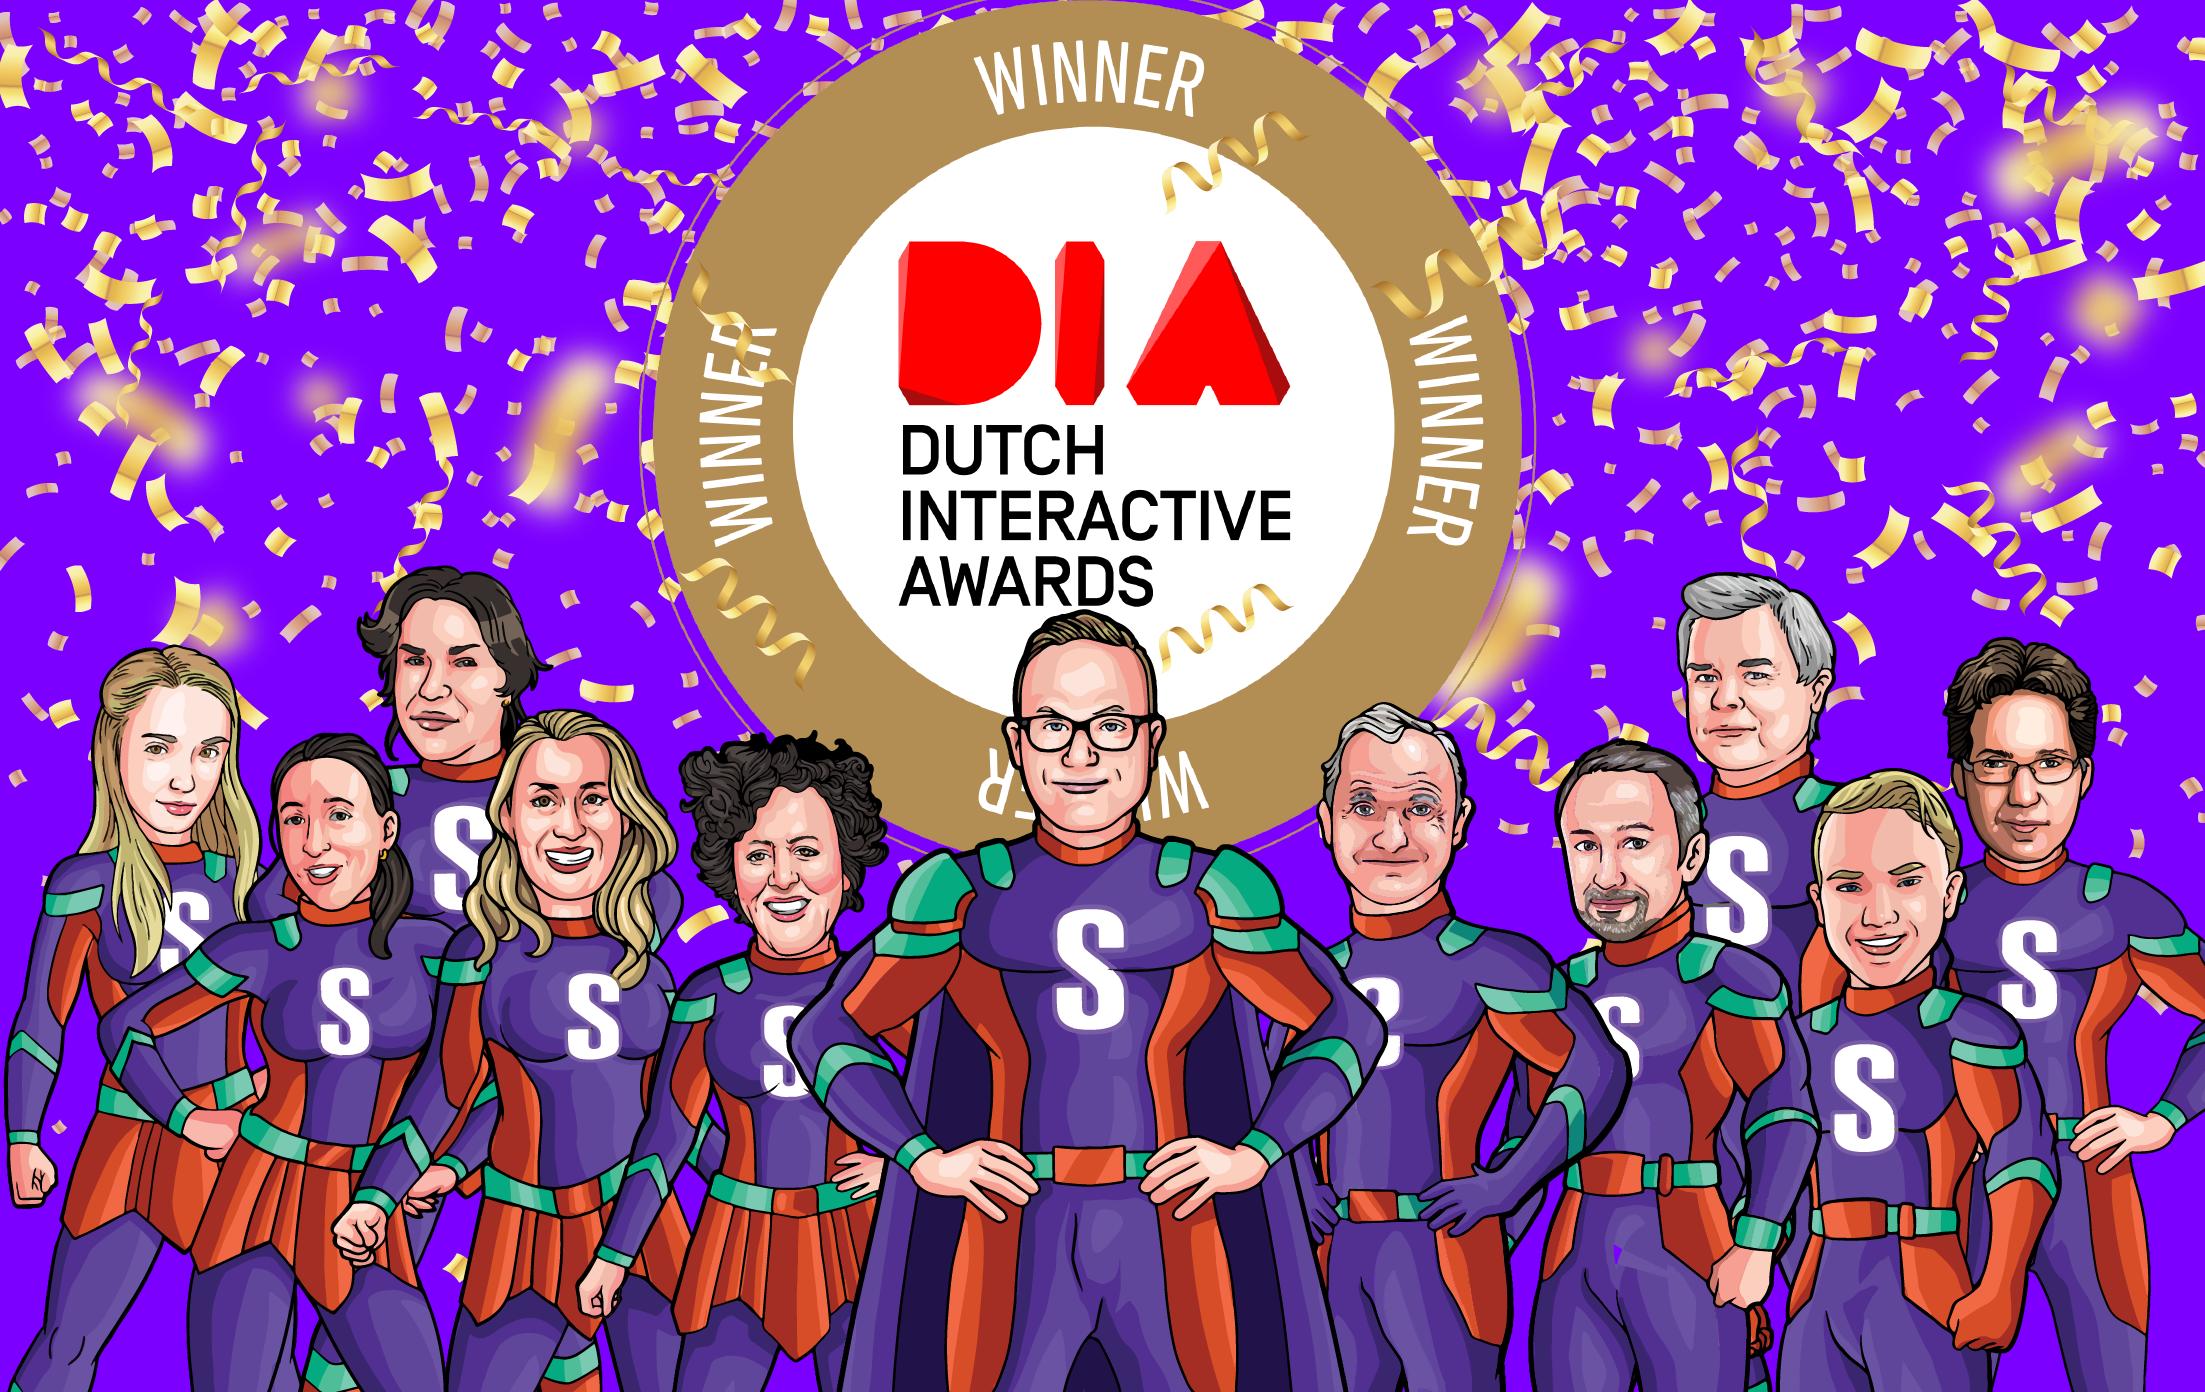 AD(H)D-app Superbrains wint prijs